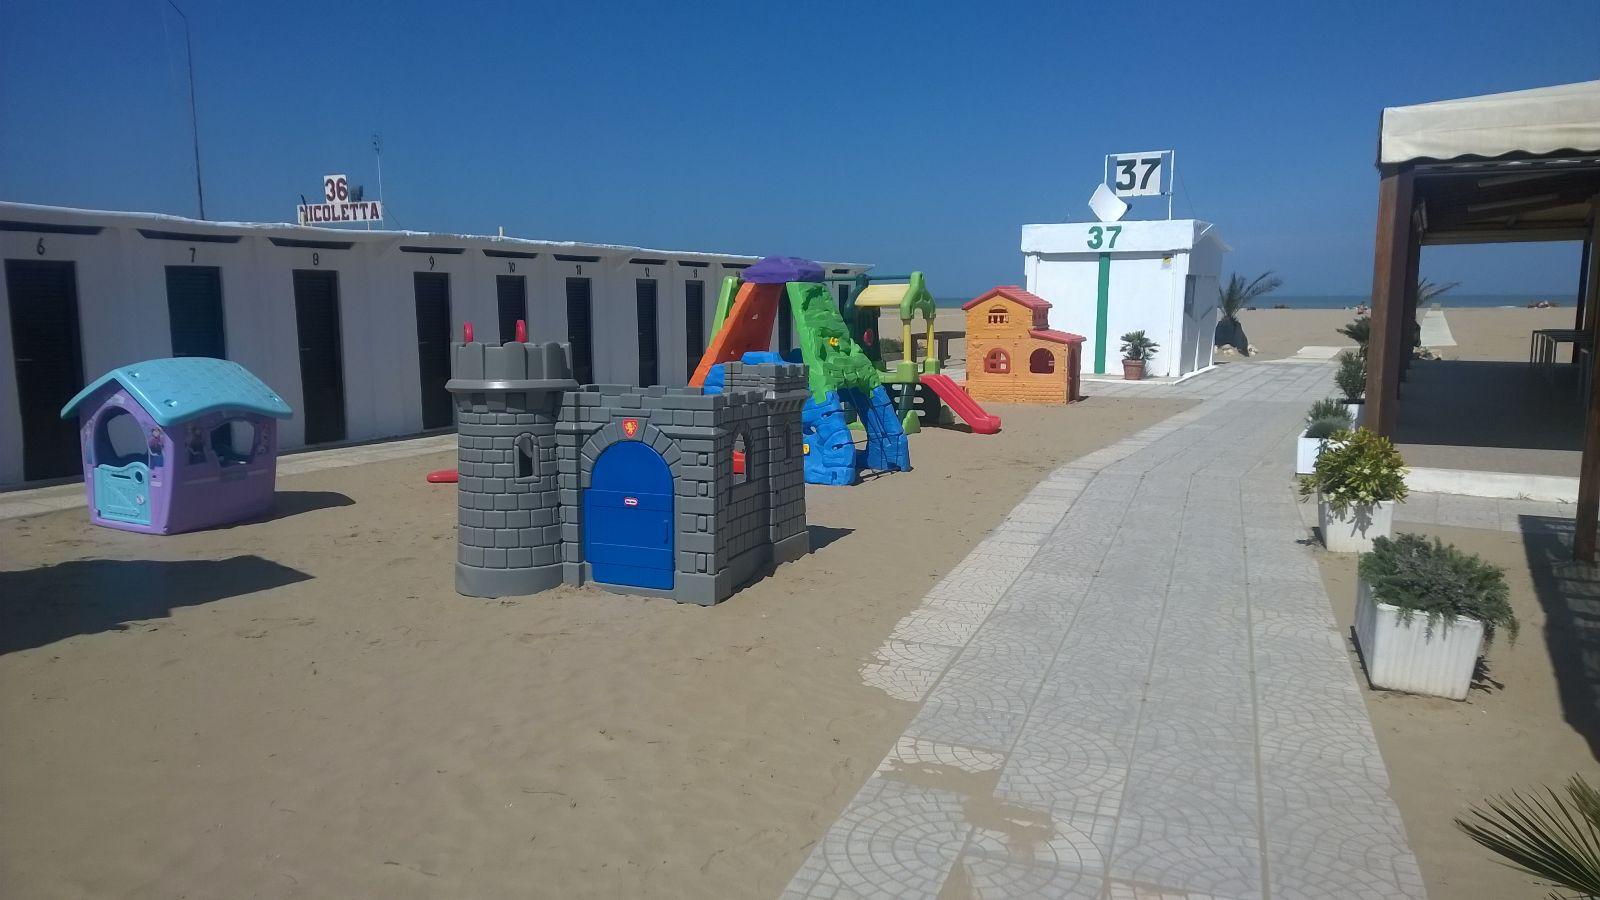 Bagno 37 - Dave's Beach